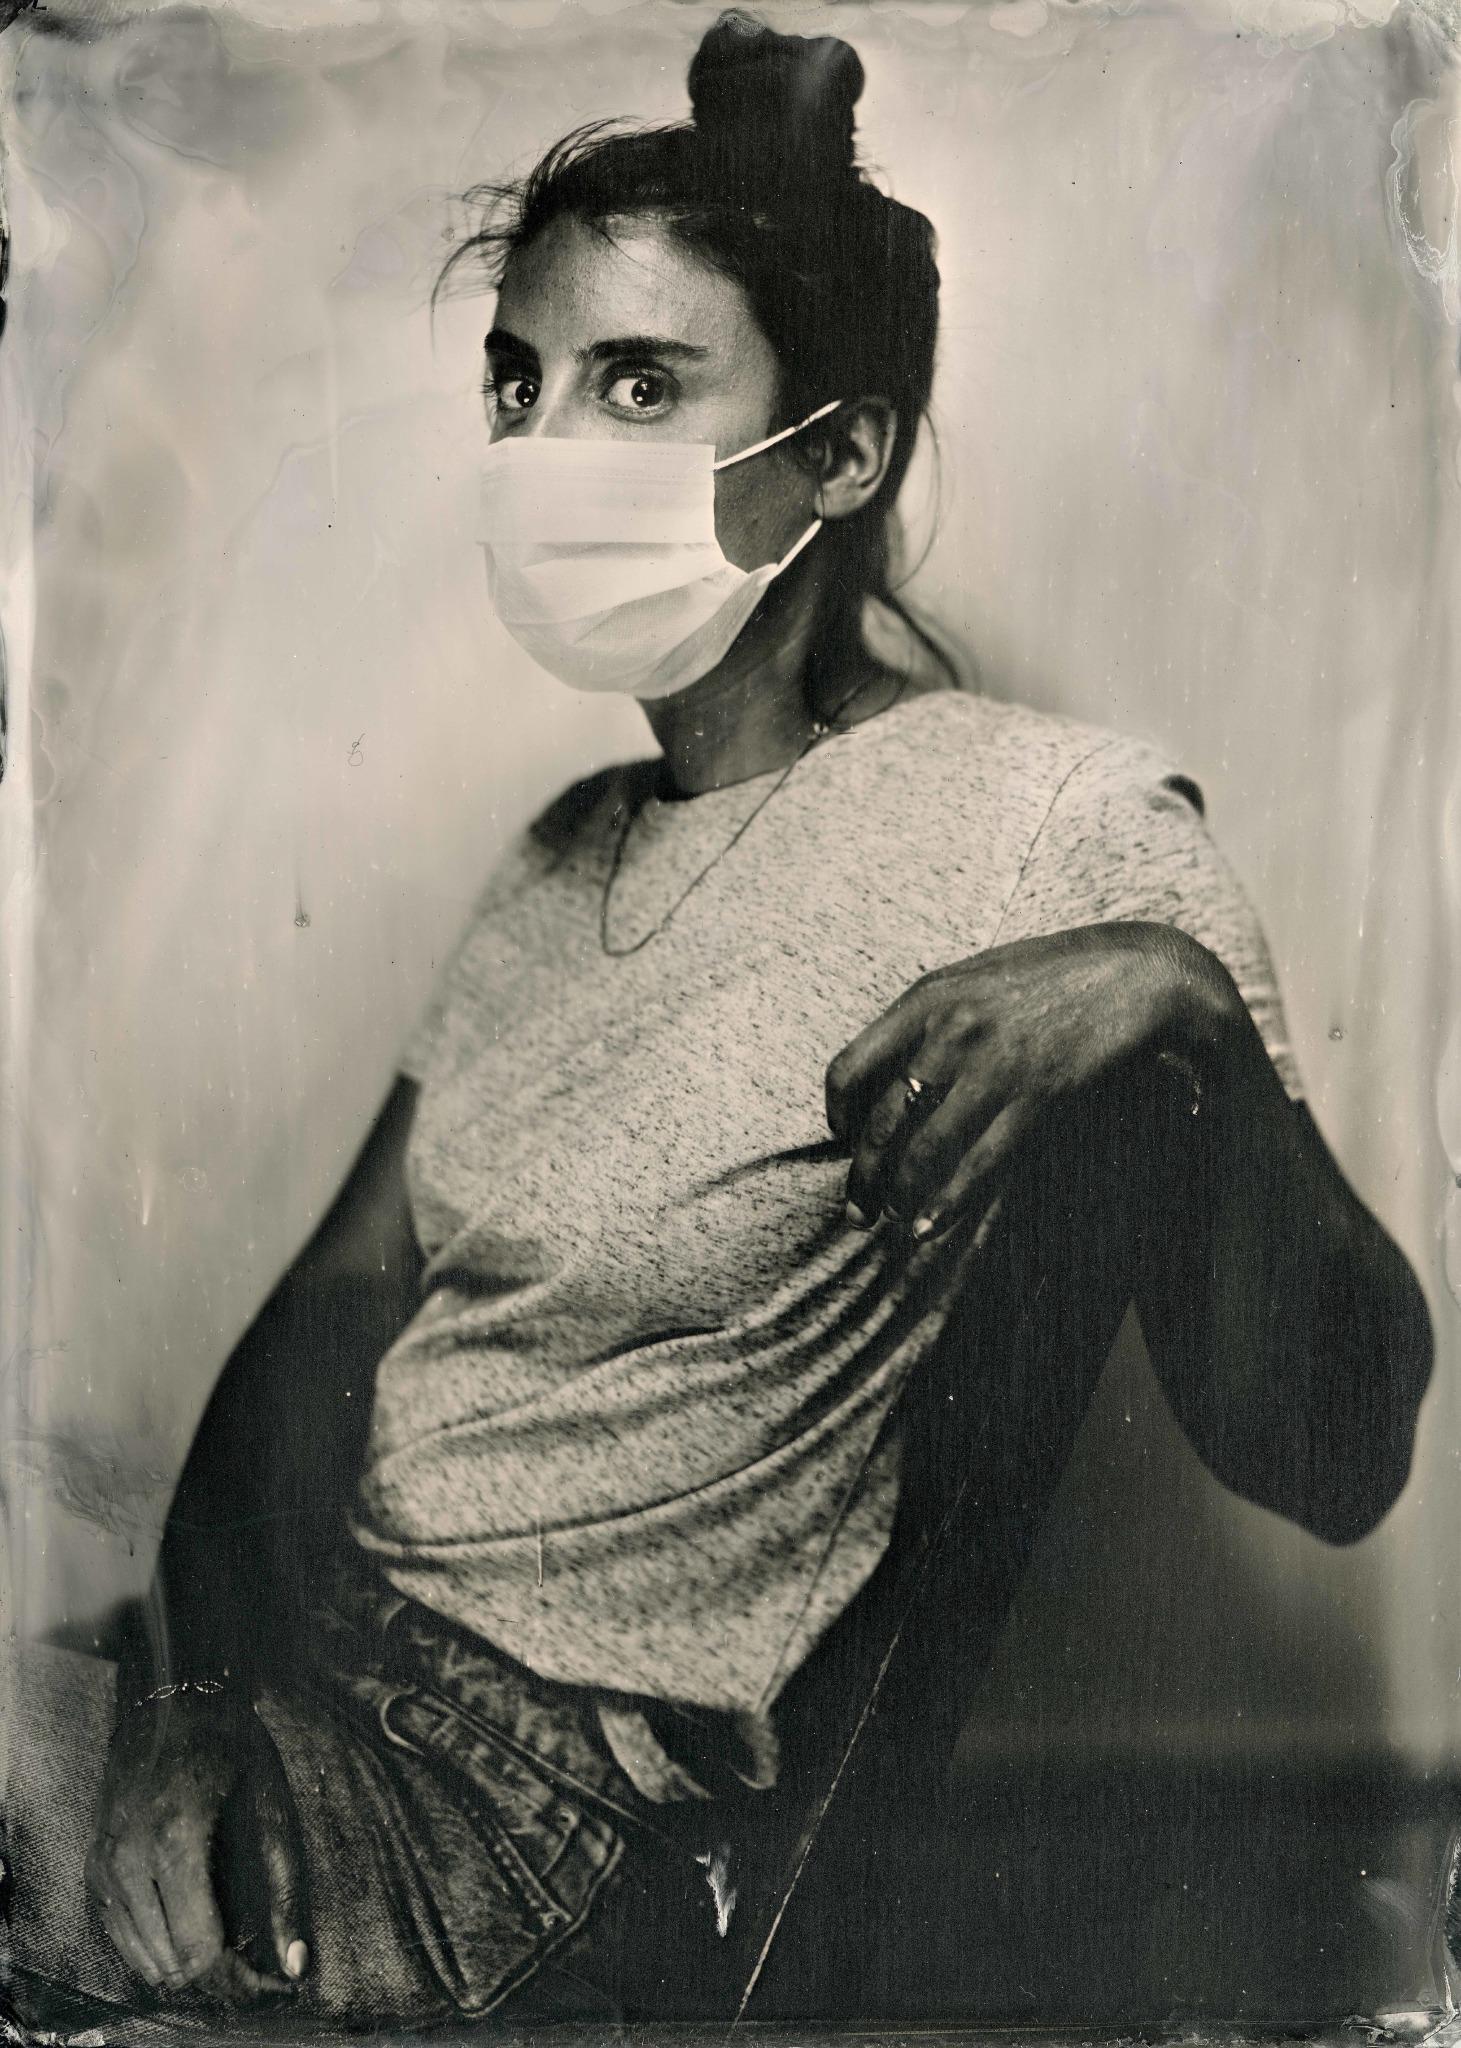 Portrait masque ferrotype 2020 © Jonathan Pierredon